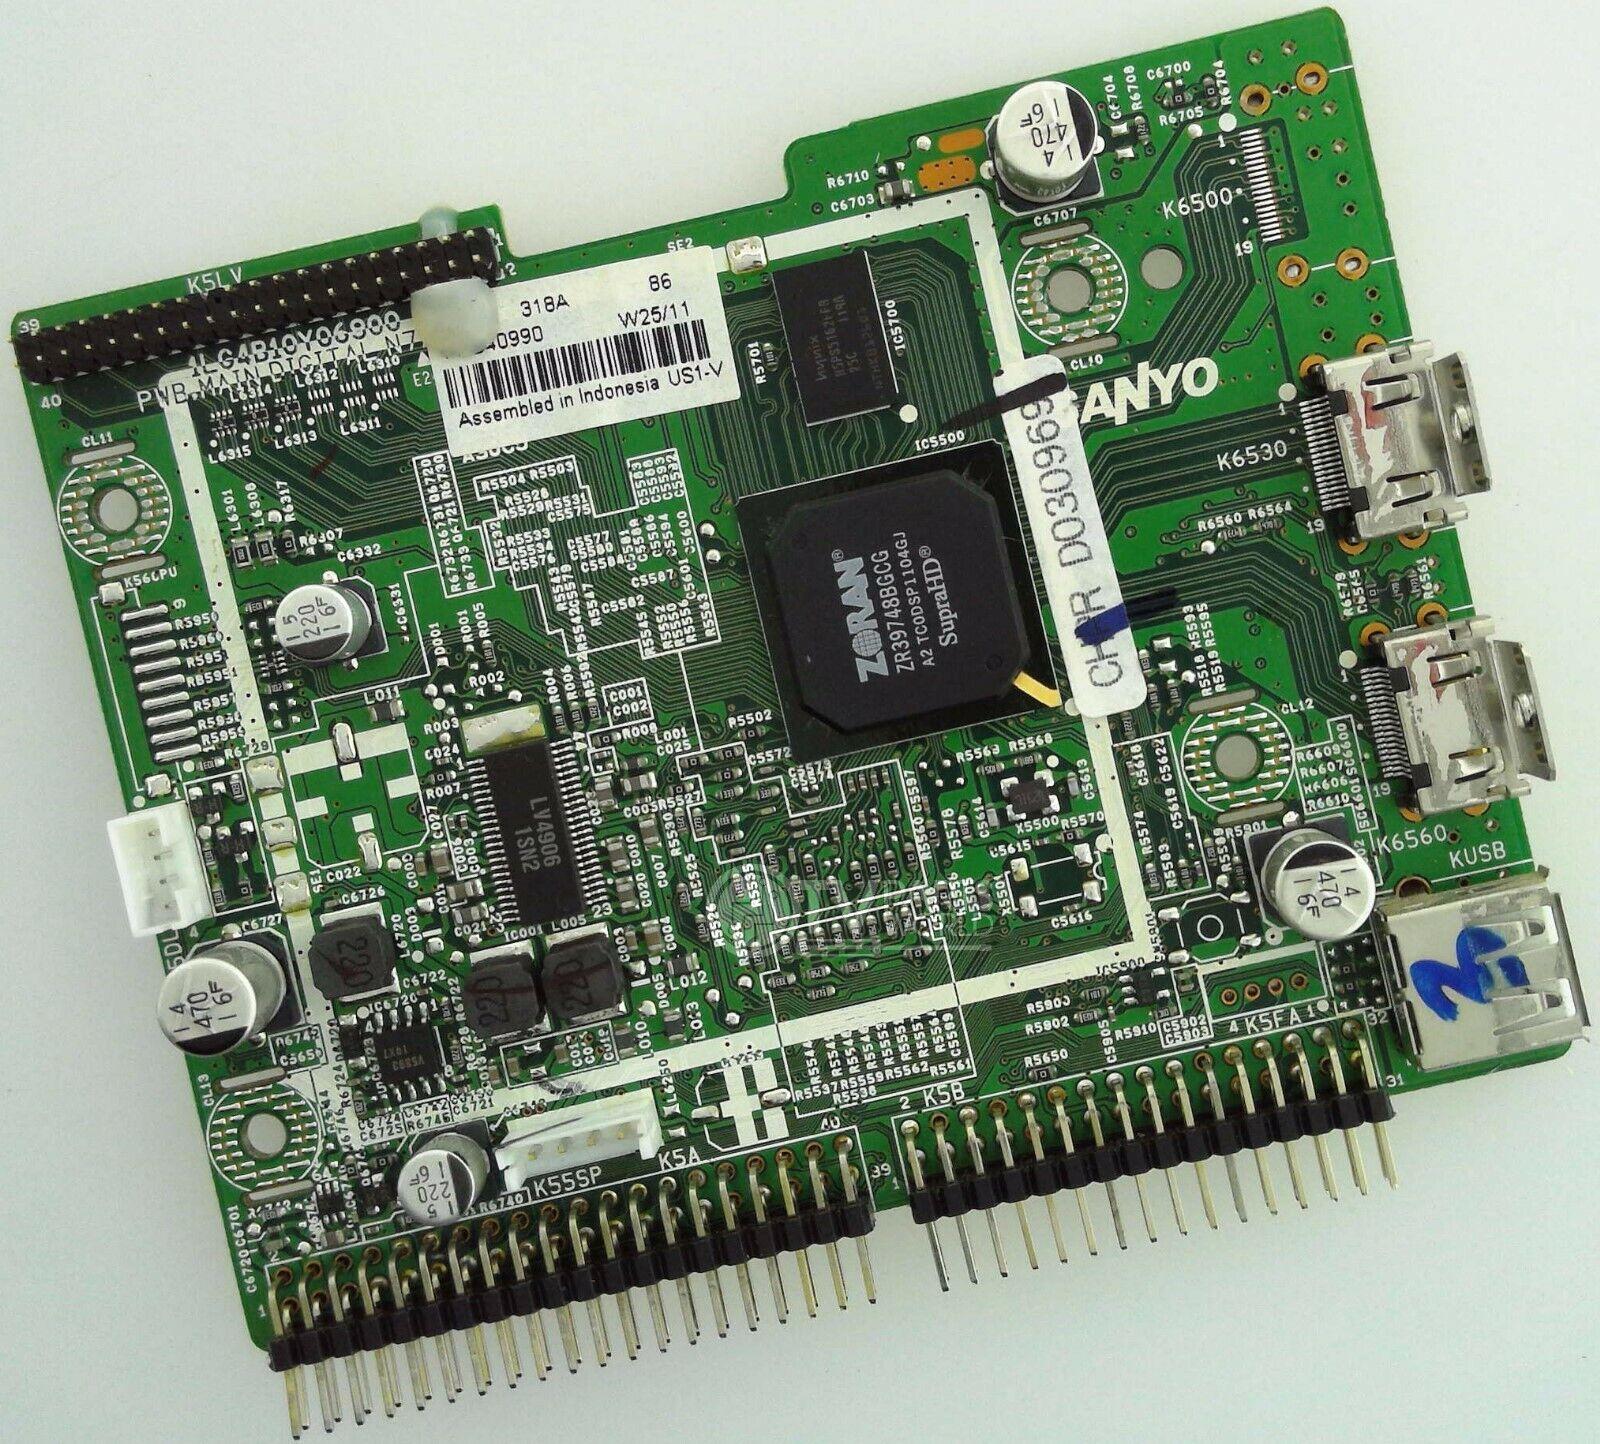 SANYO 58 DP58D33-01 1LG4B10Y1170A 1LG4B10Y117000 Z7GA Digital Main Board